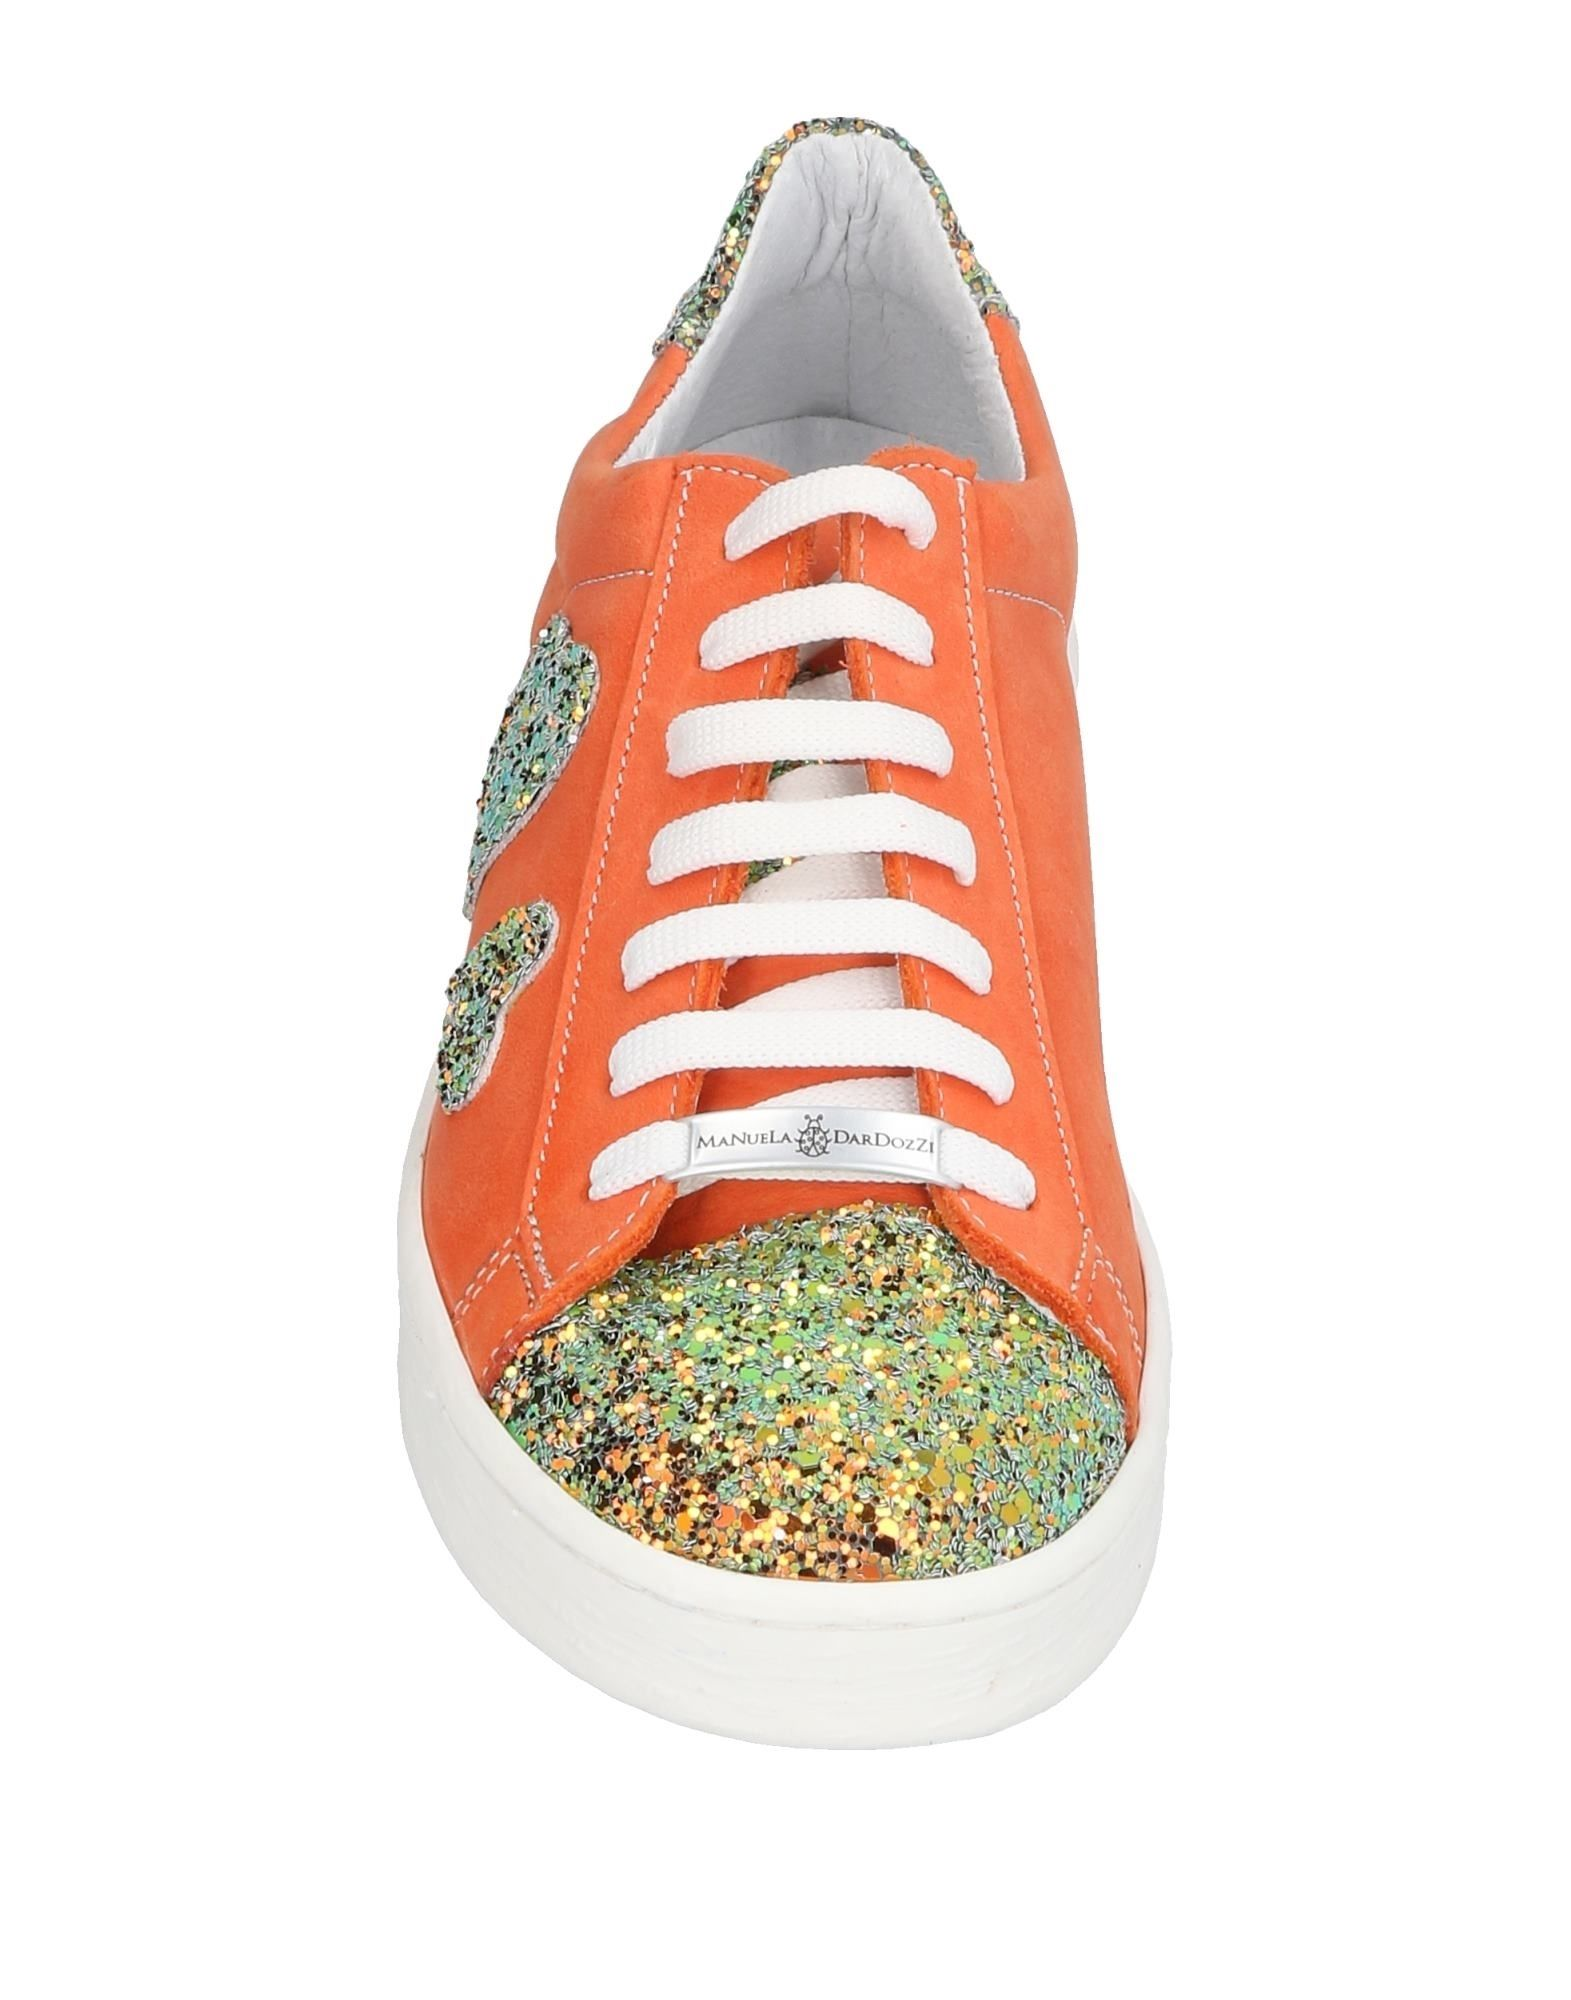 Manuela Dardozzi Sneakers Damen   11423453OG   e425f3